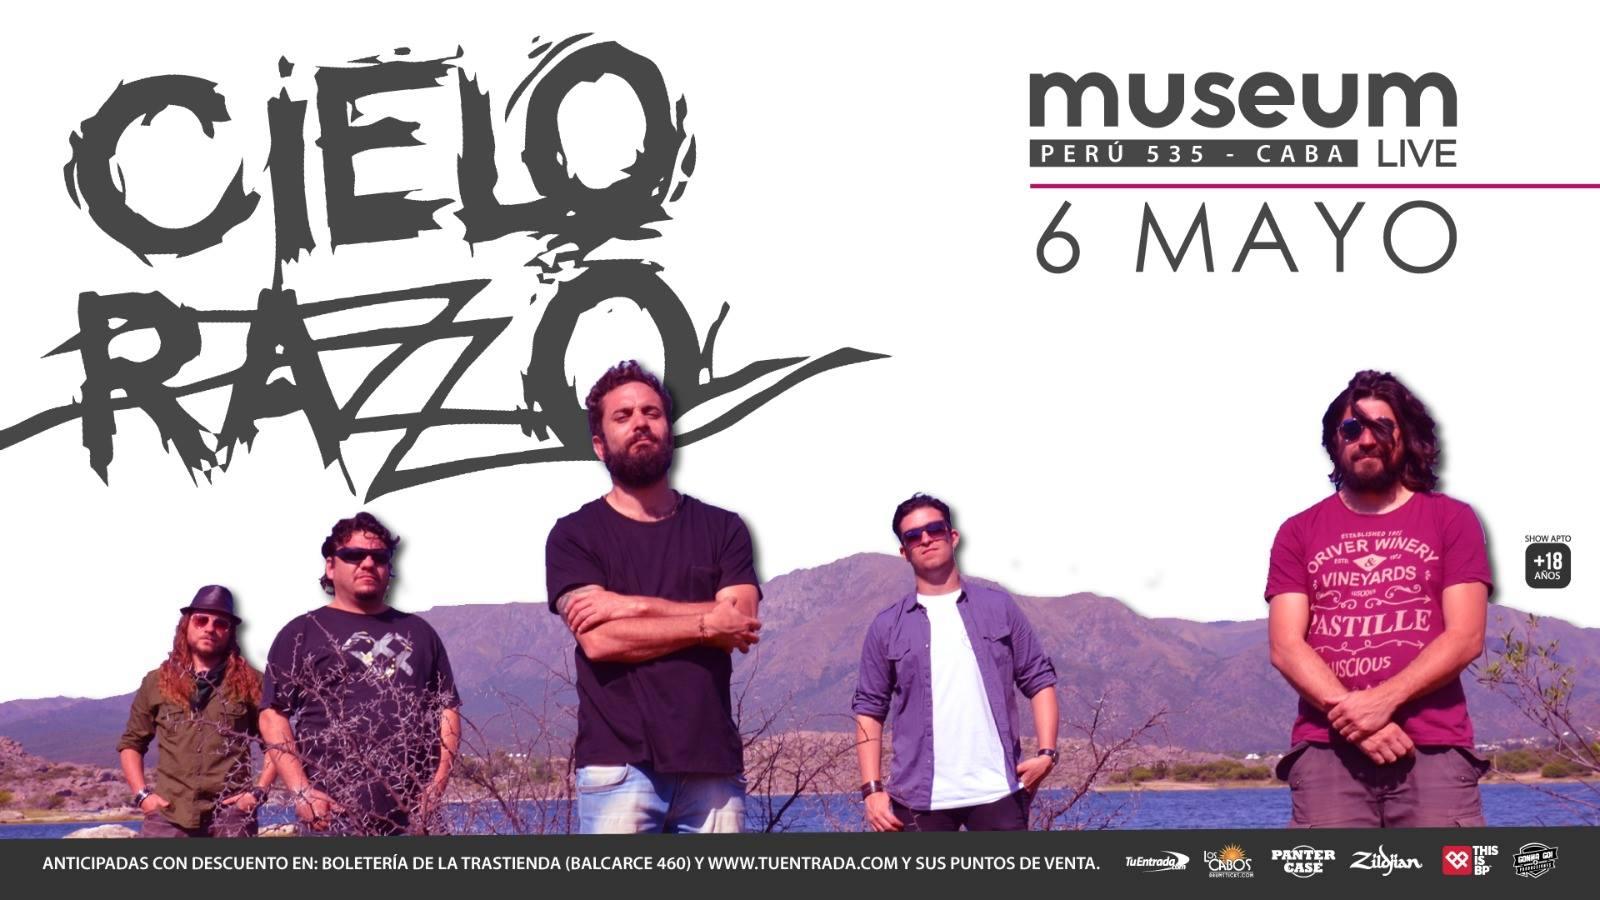 Cielo Razzo Museum mayo